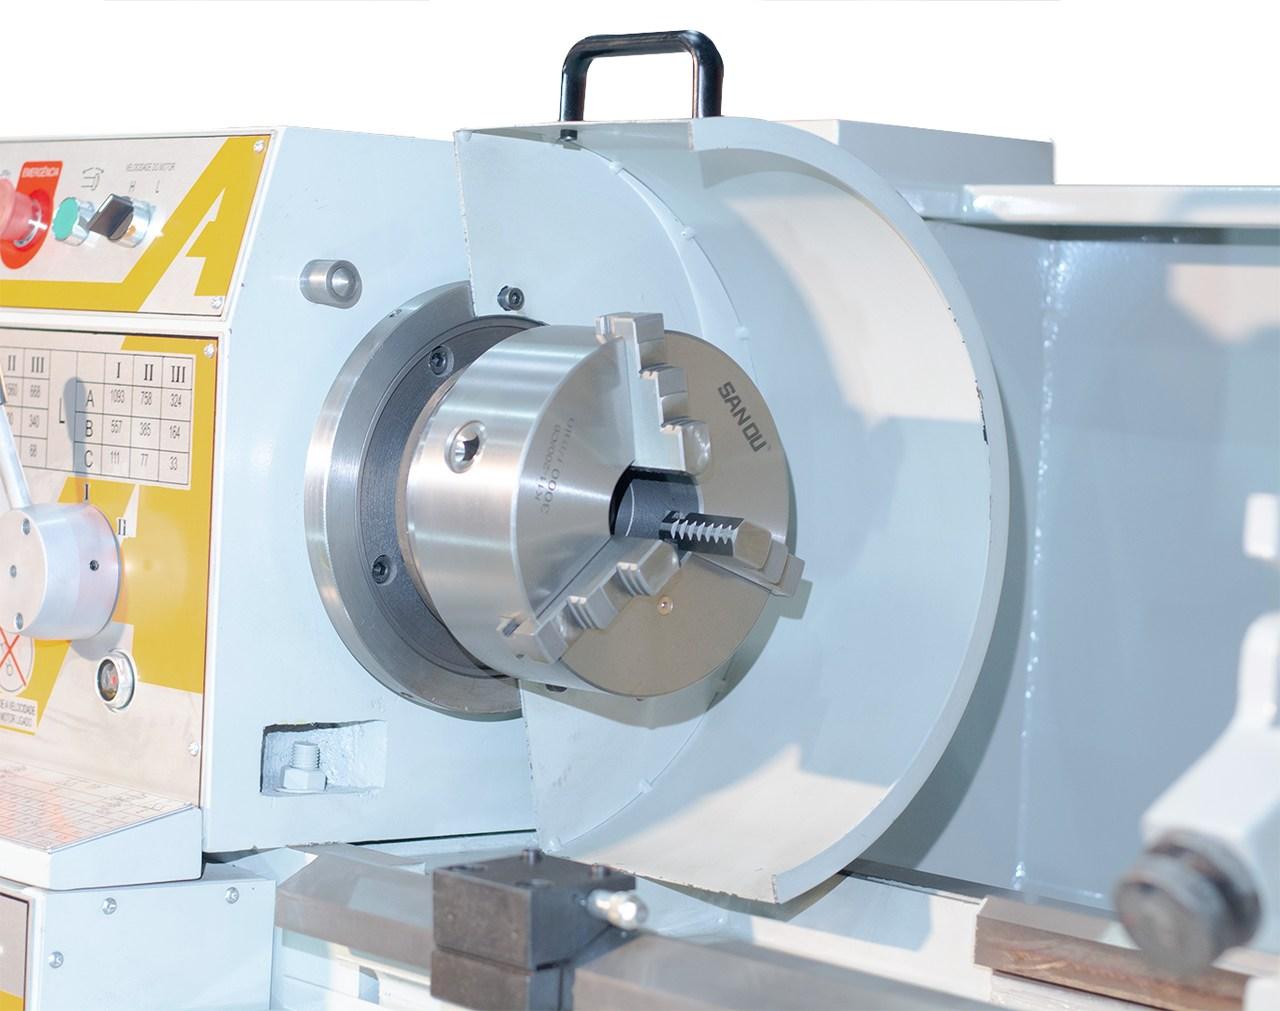 Torno Mecânico ATLASMAQ TMX-410 - Produto Novo  - Atlasmaq